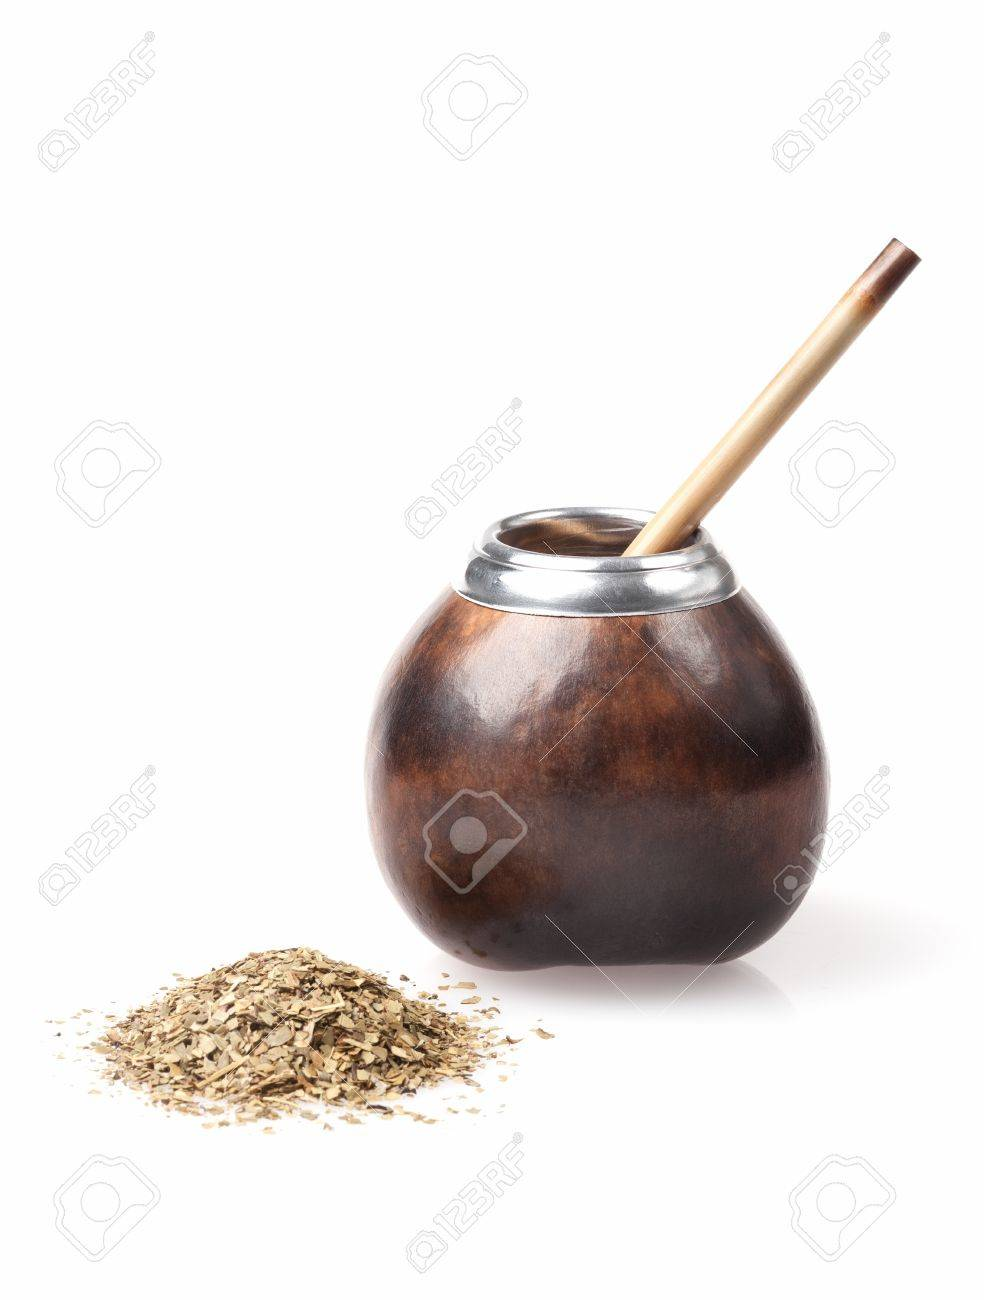 calabash and bombilla with yerba mate isolated on white background Stock Photo - 20190595